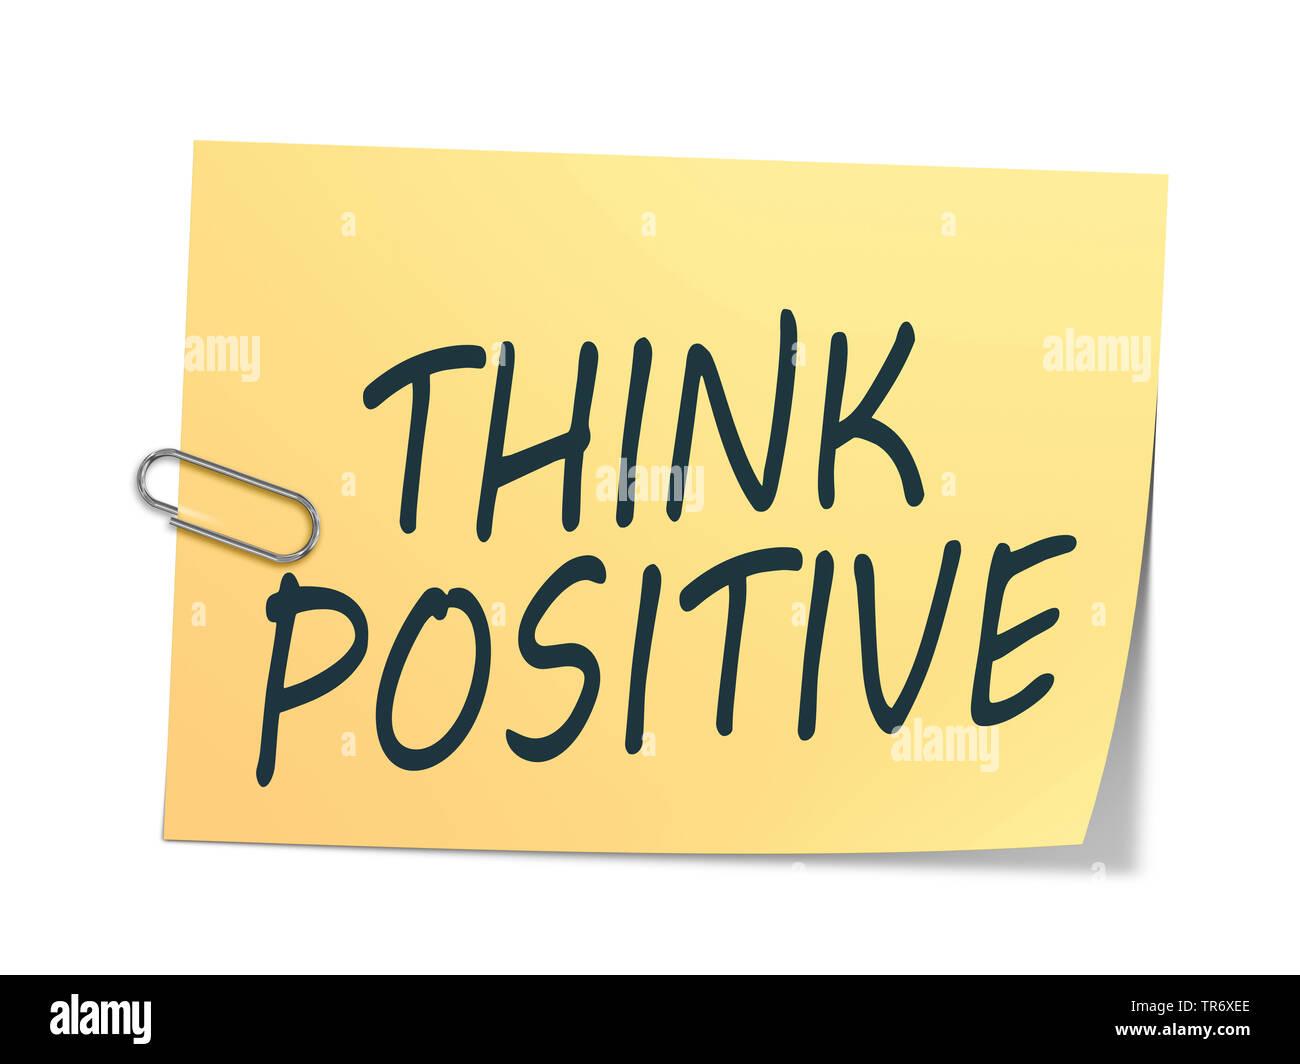 3D-Computergrafik, Gelb mit Aufschrift Notizzettel en pensar positivo (positiv denken)   Equipo 3D, gráficos en color amarillo memo leyendo PENSAR POSITI Imagen De Stock